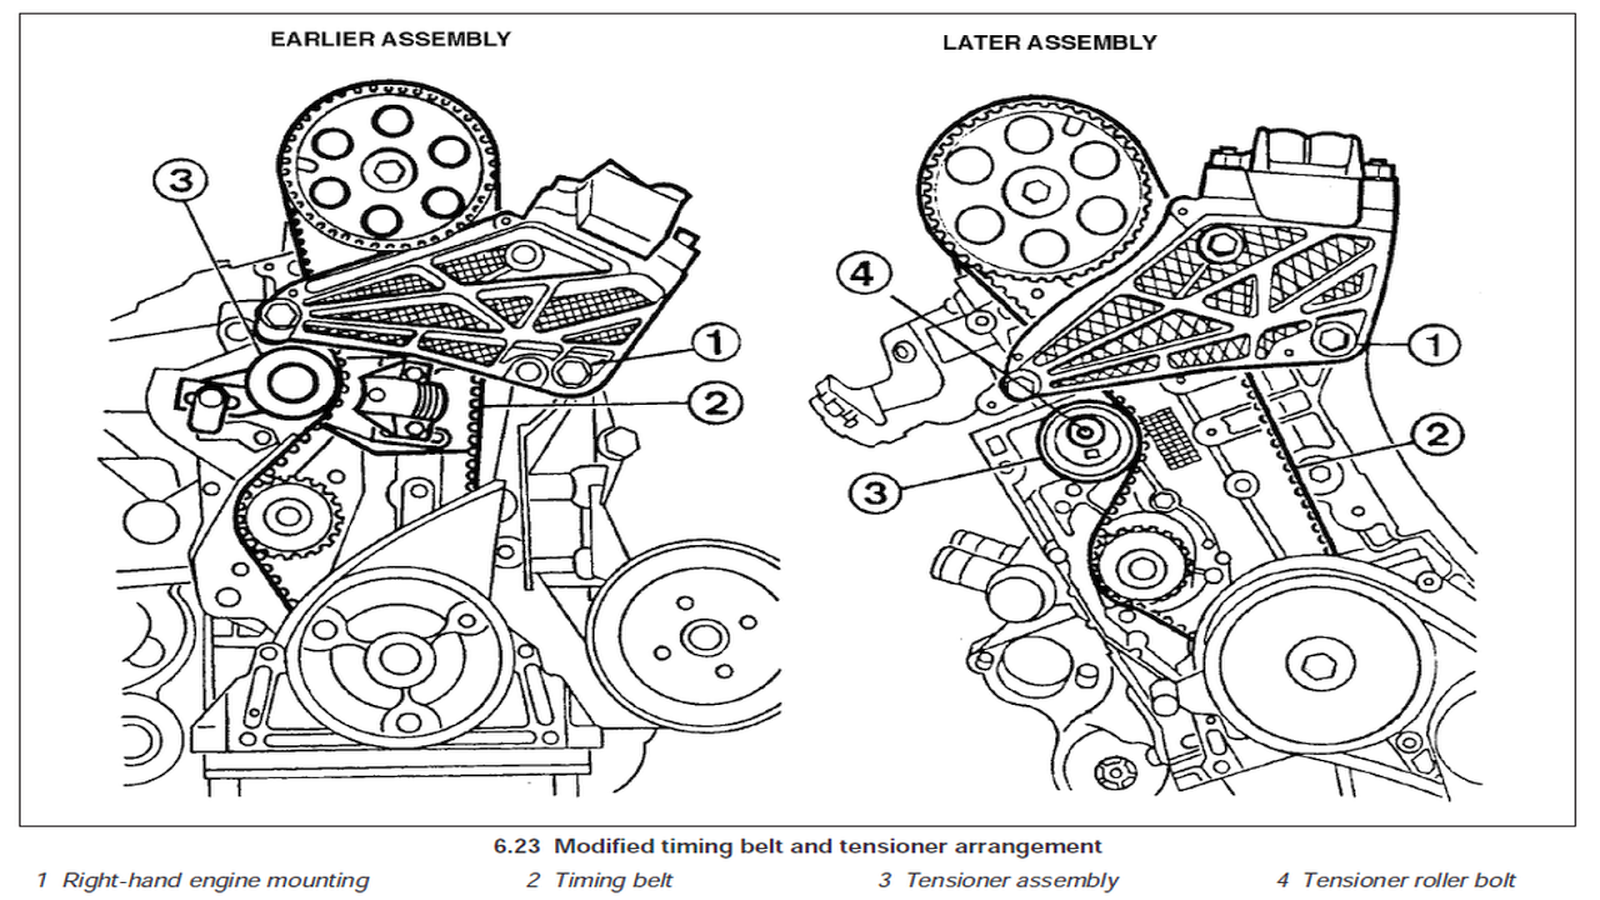 citroen c3 wiring diagram pdf [ 1600 x 900 Pixel ]